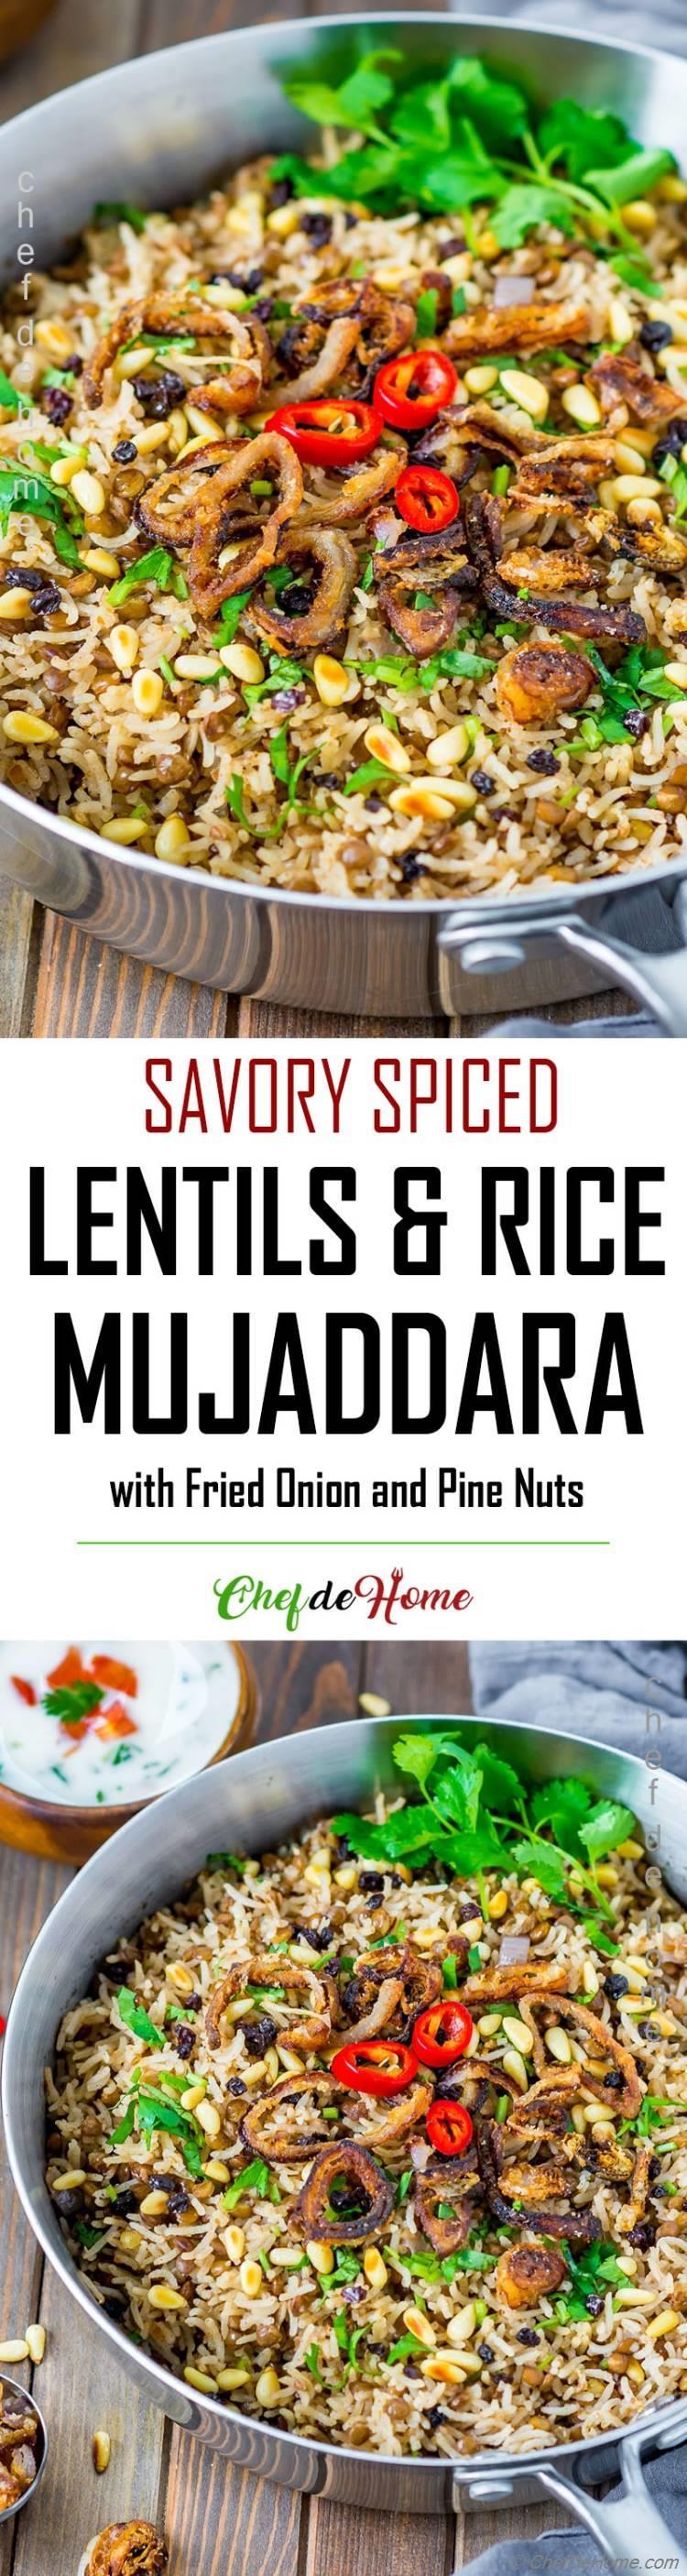 Easy Mujaddara Recipe